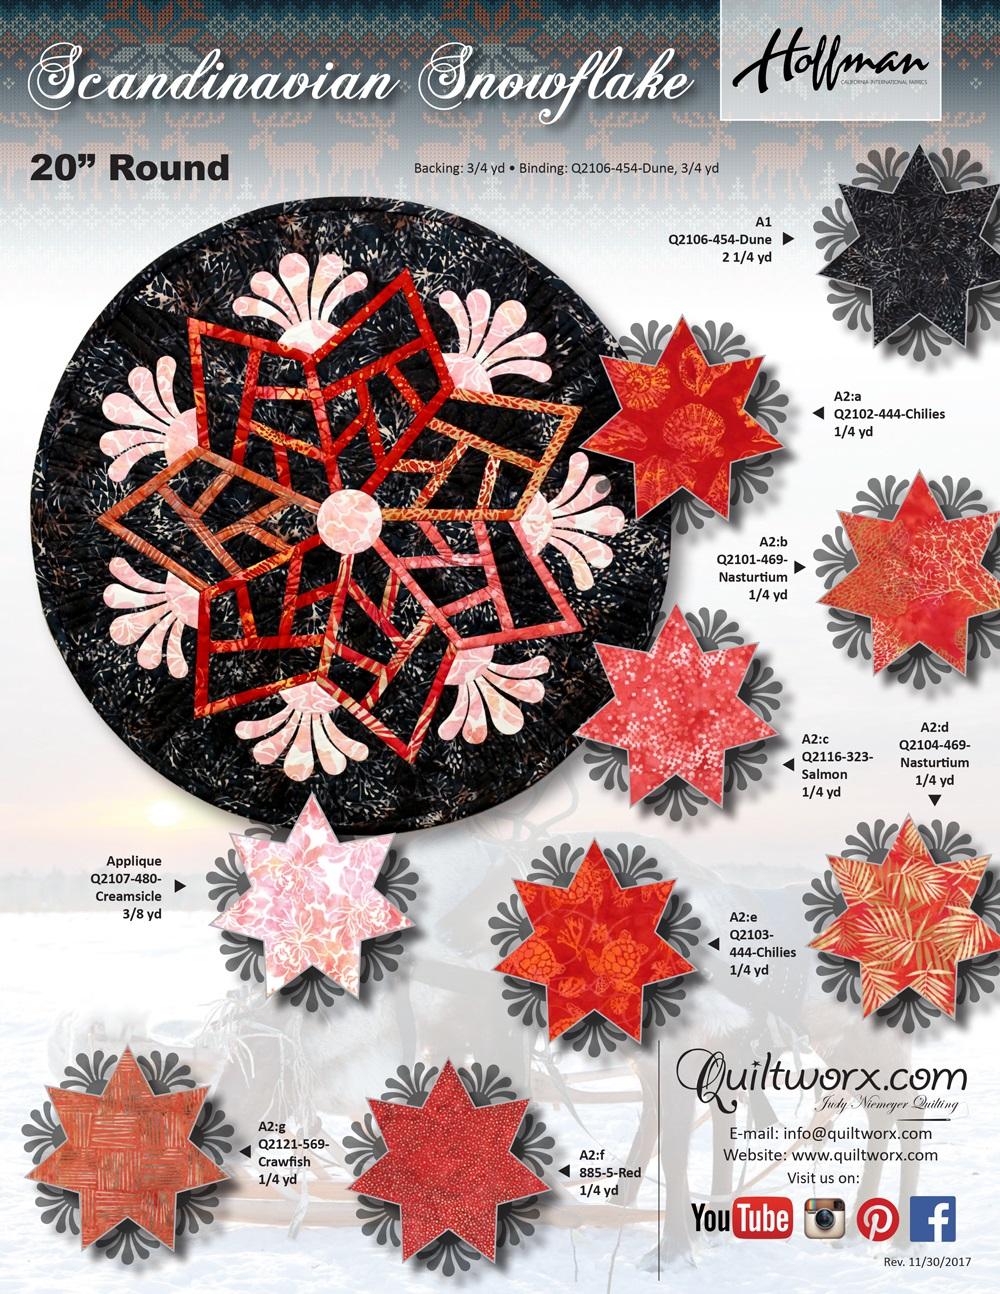 Scandinavian-Snowflake-(Black)-Hoffman-KS-1